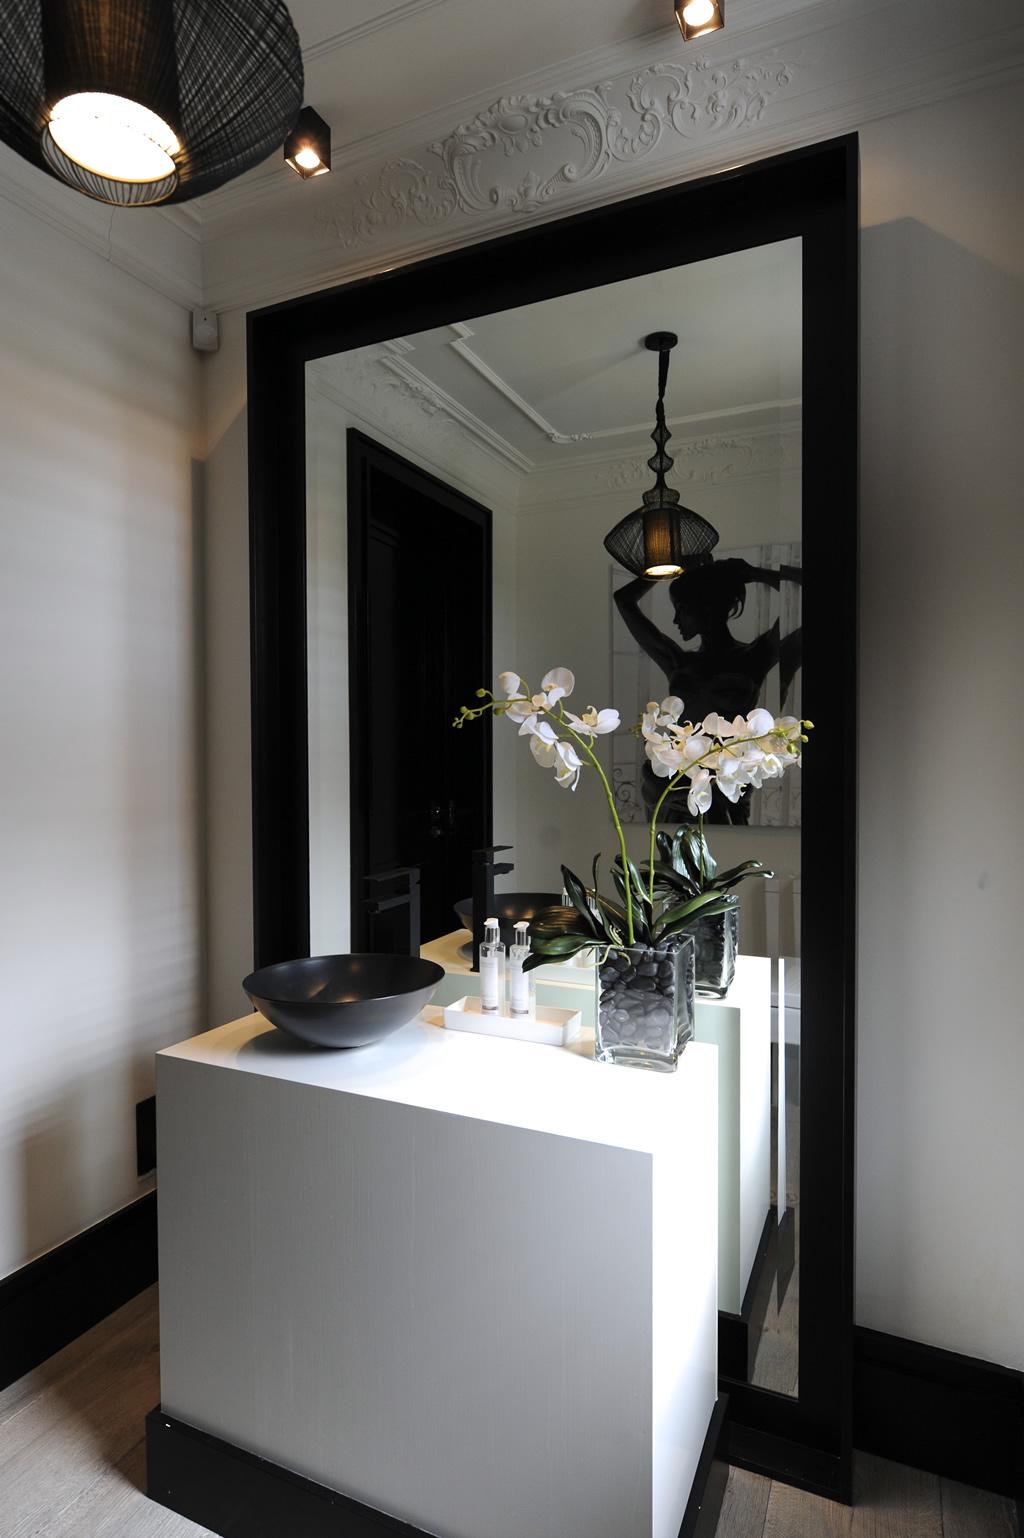 aleksandra miecznicka black white. Black Bedroom Furniture Sets. Home Design Ideas